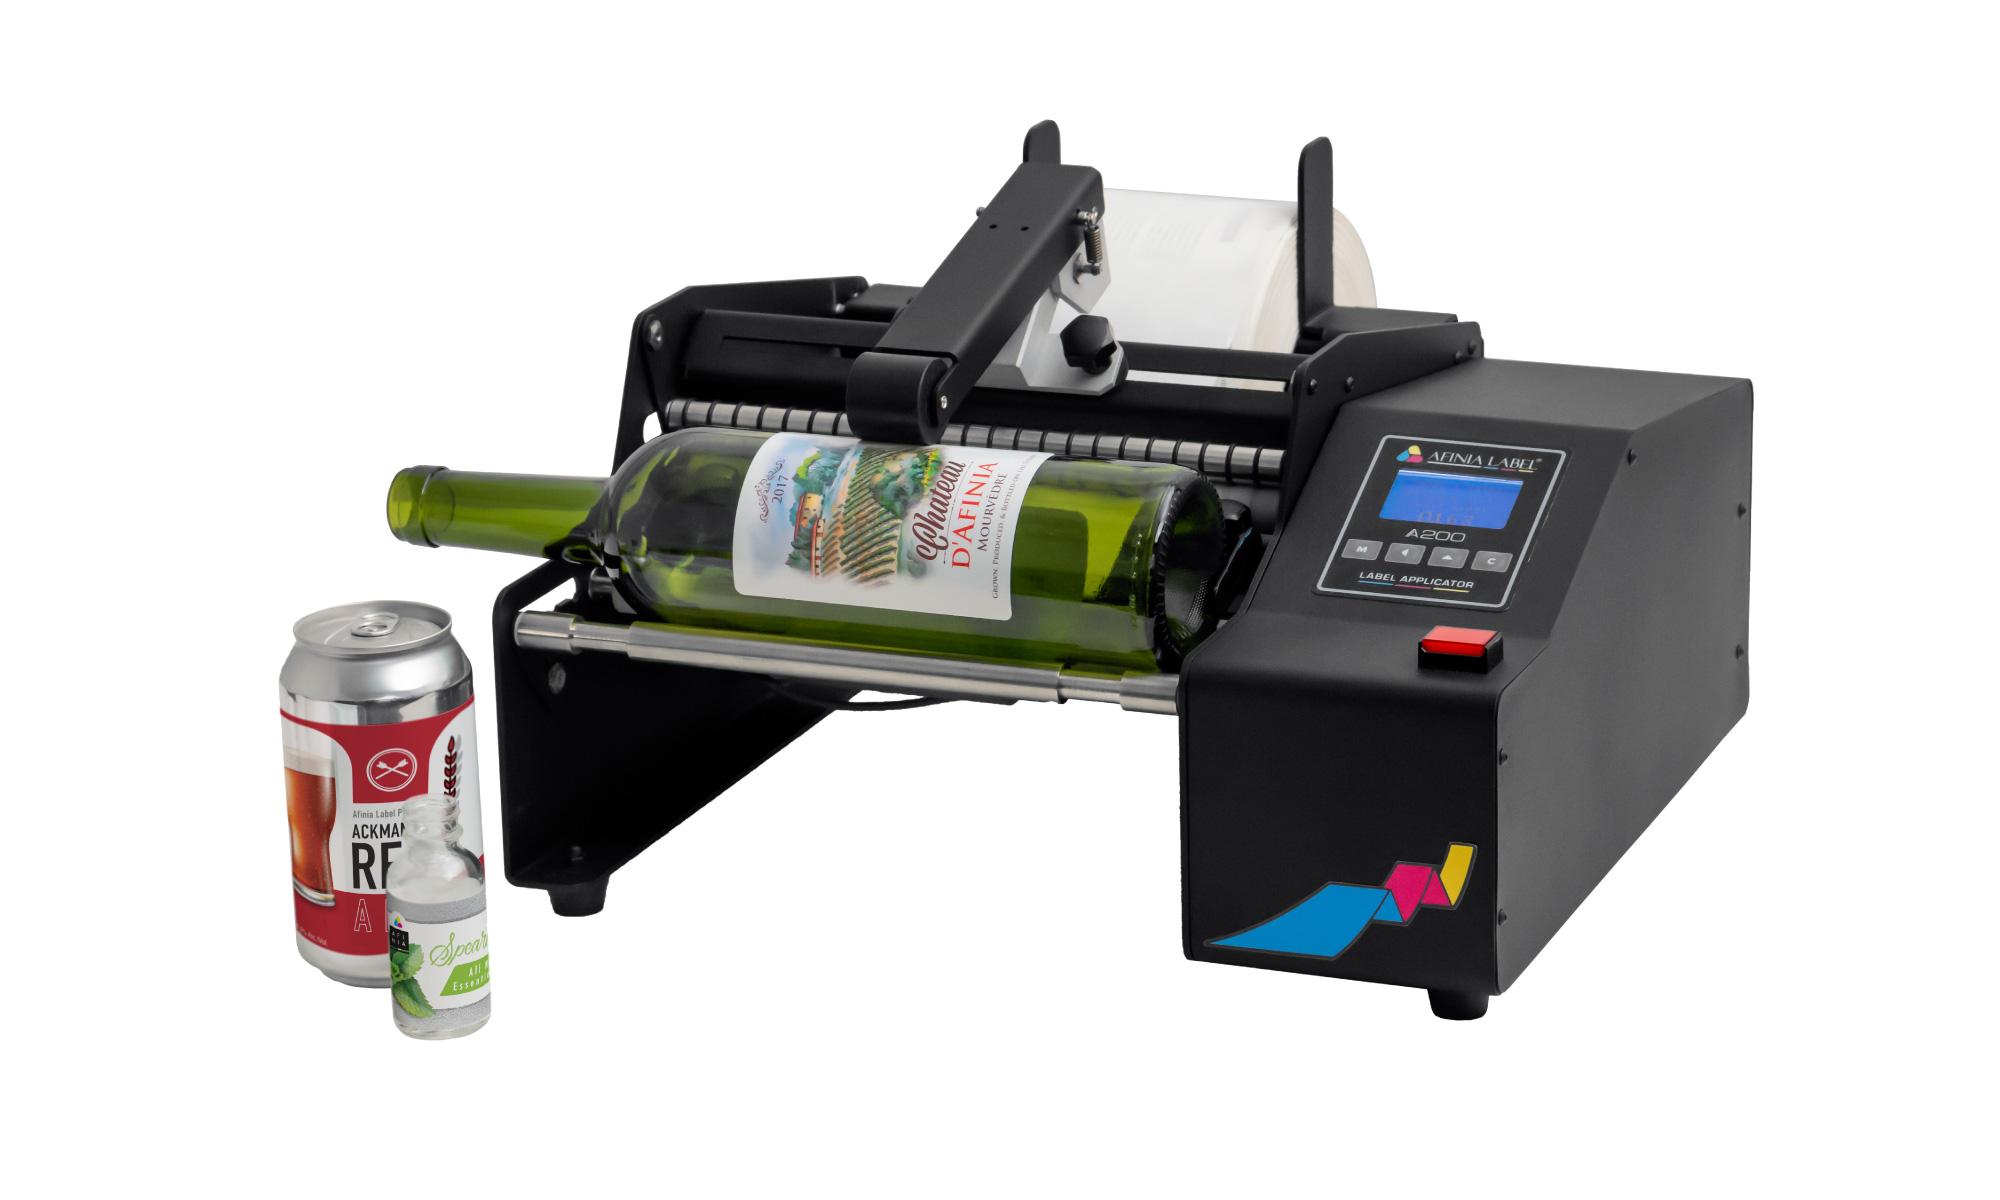 Top Printer Accessories That Enhance Productivity